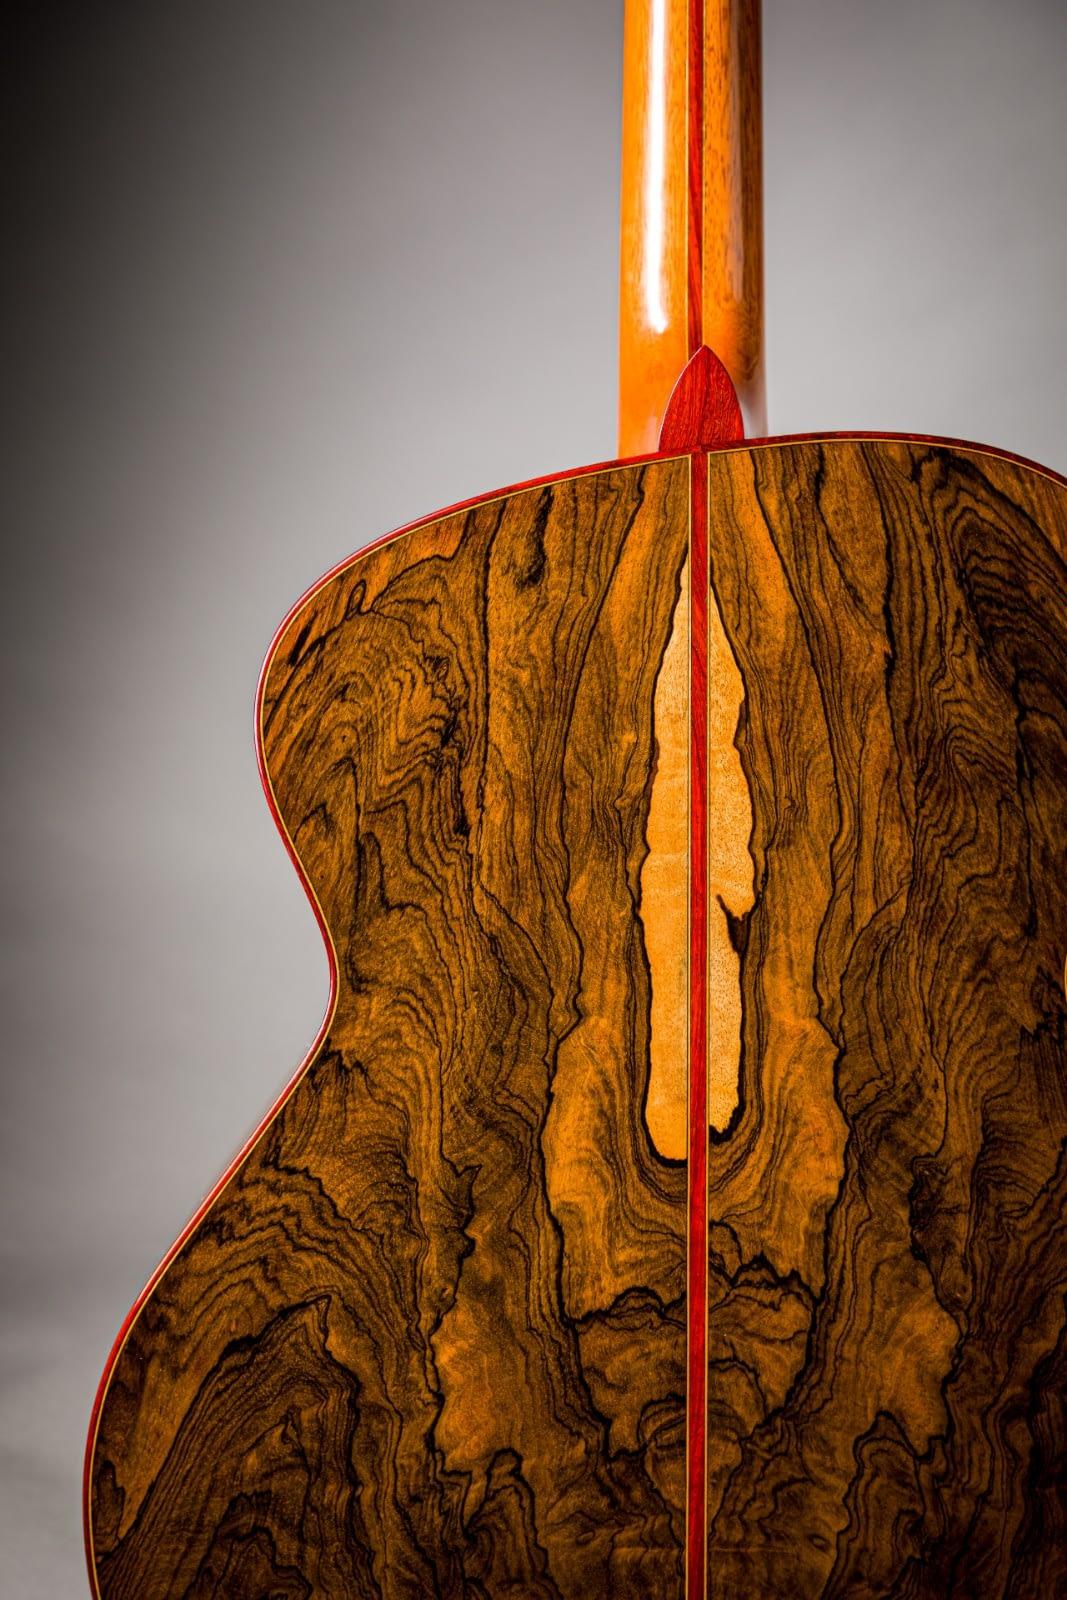 ziricote handmade guitar back asymmetric with sapwood insight padauk binding